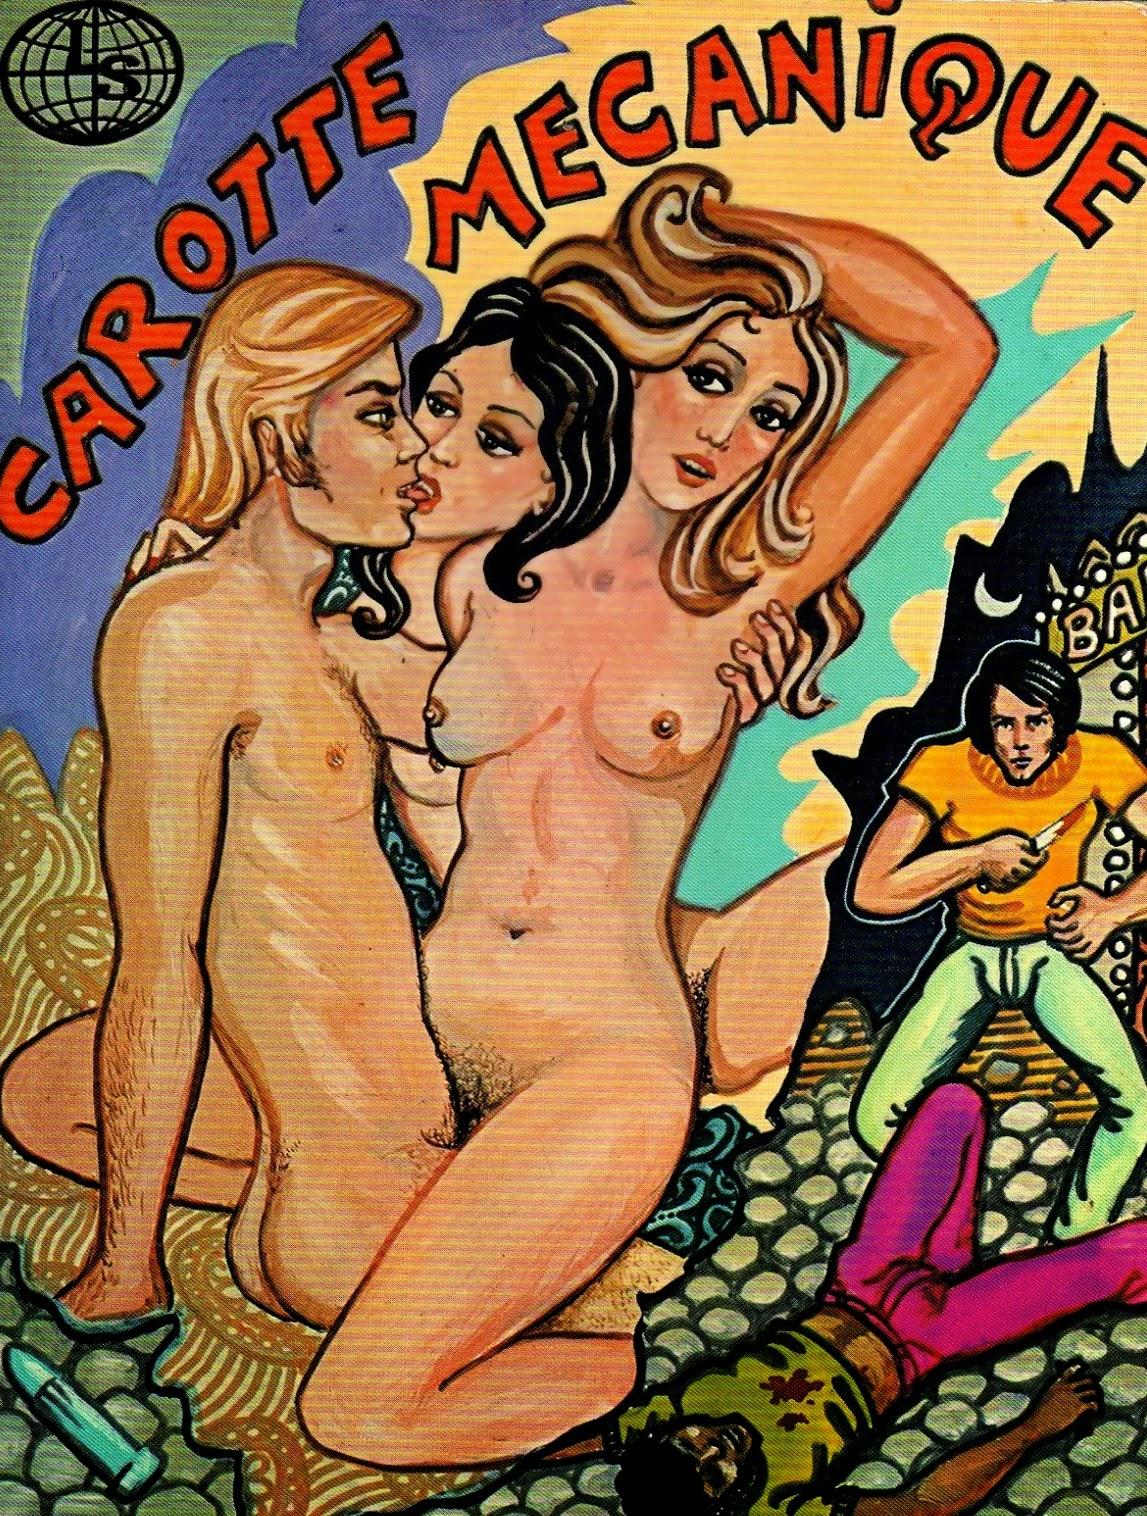 BD porno et dessins érotiques